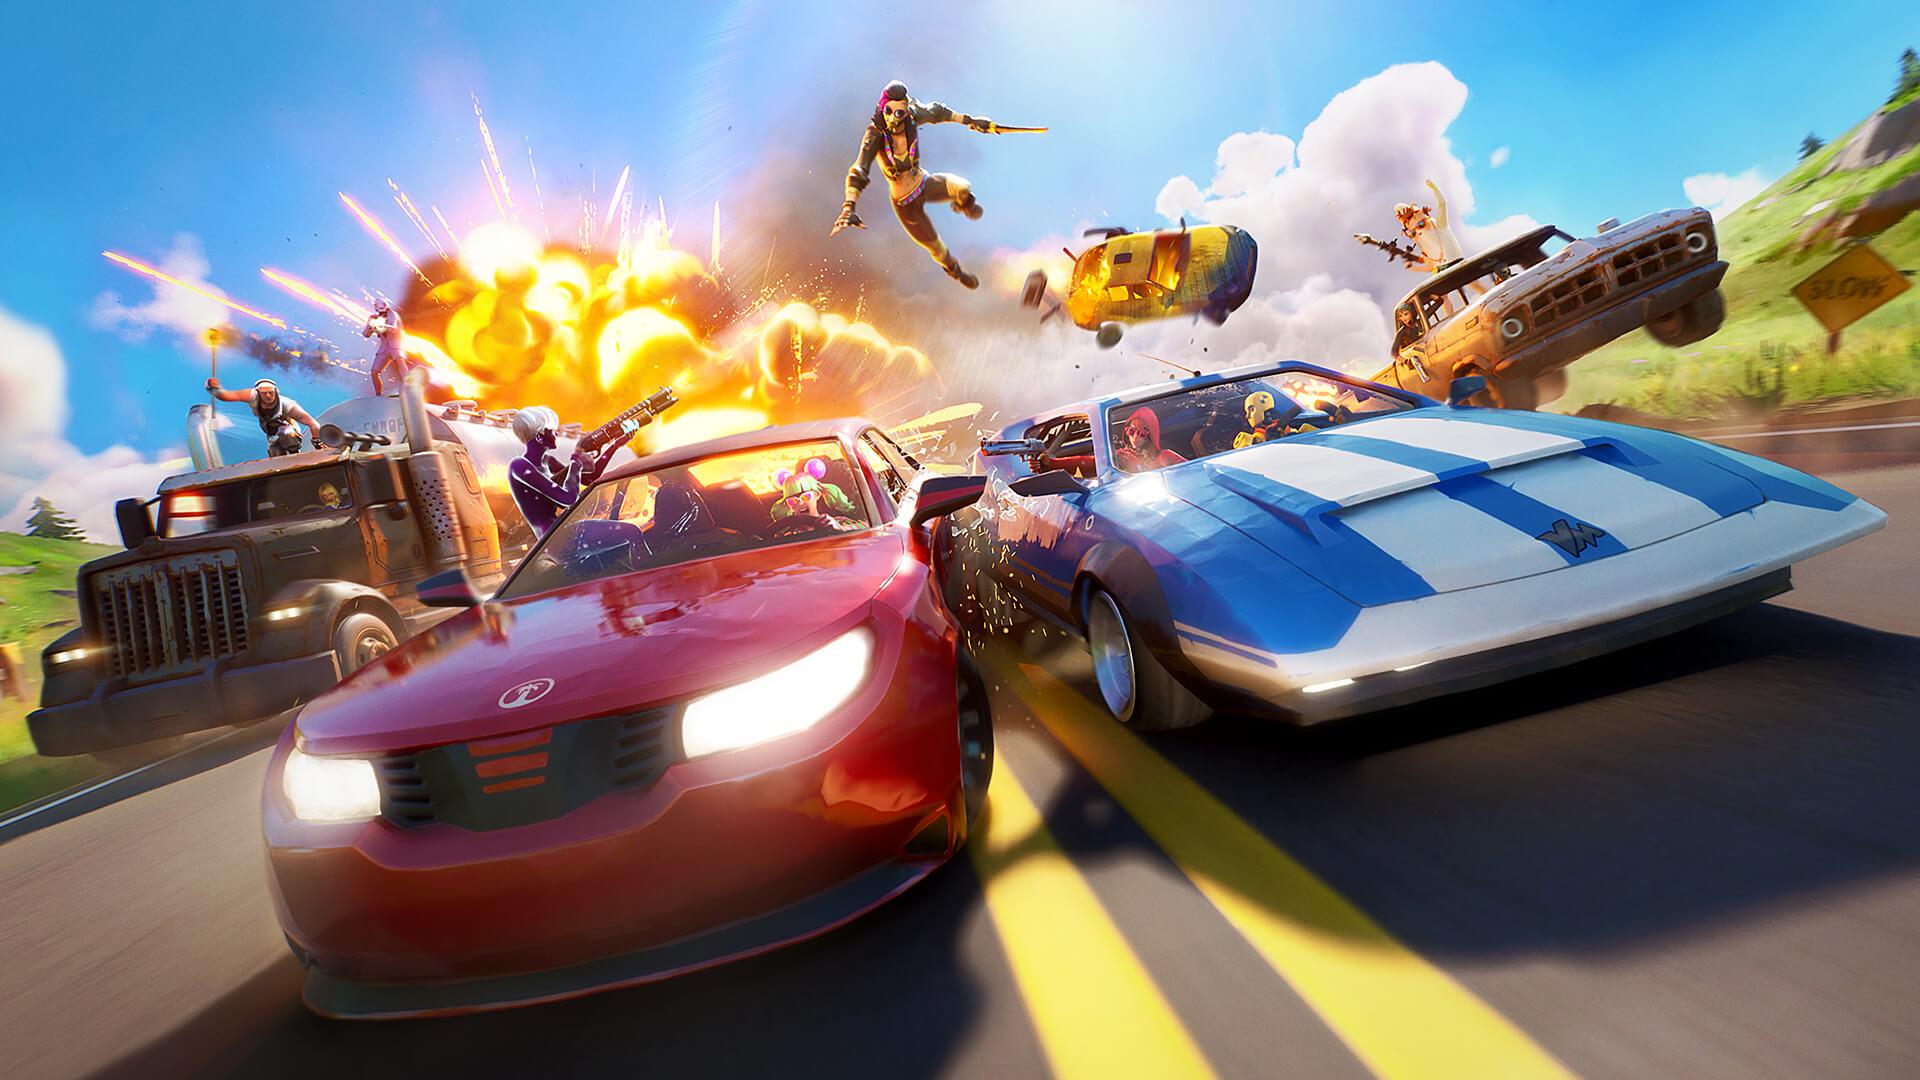 Fortnite vehicle gameplay